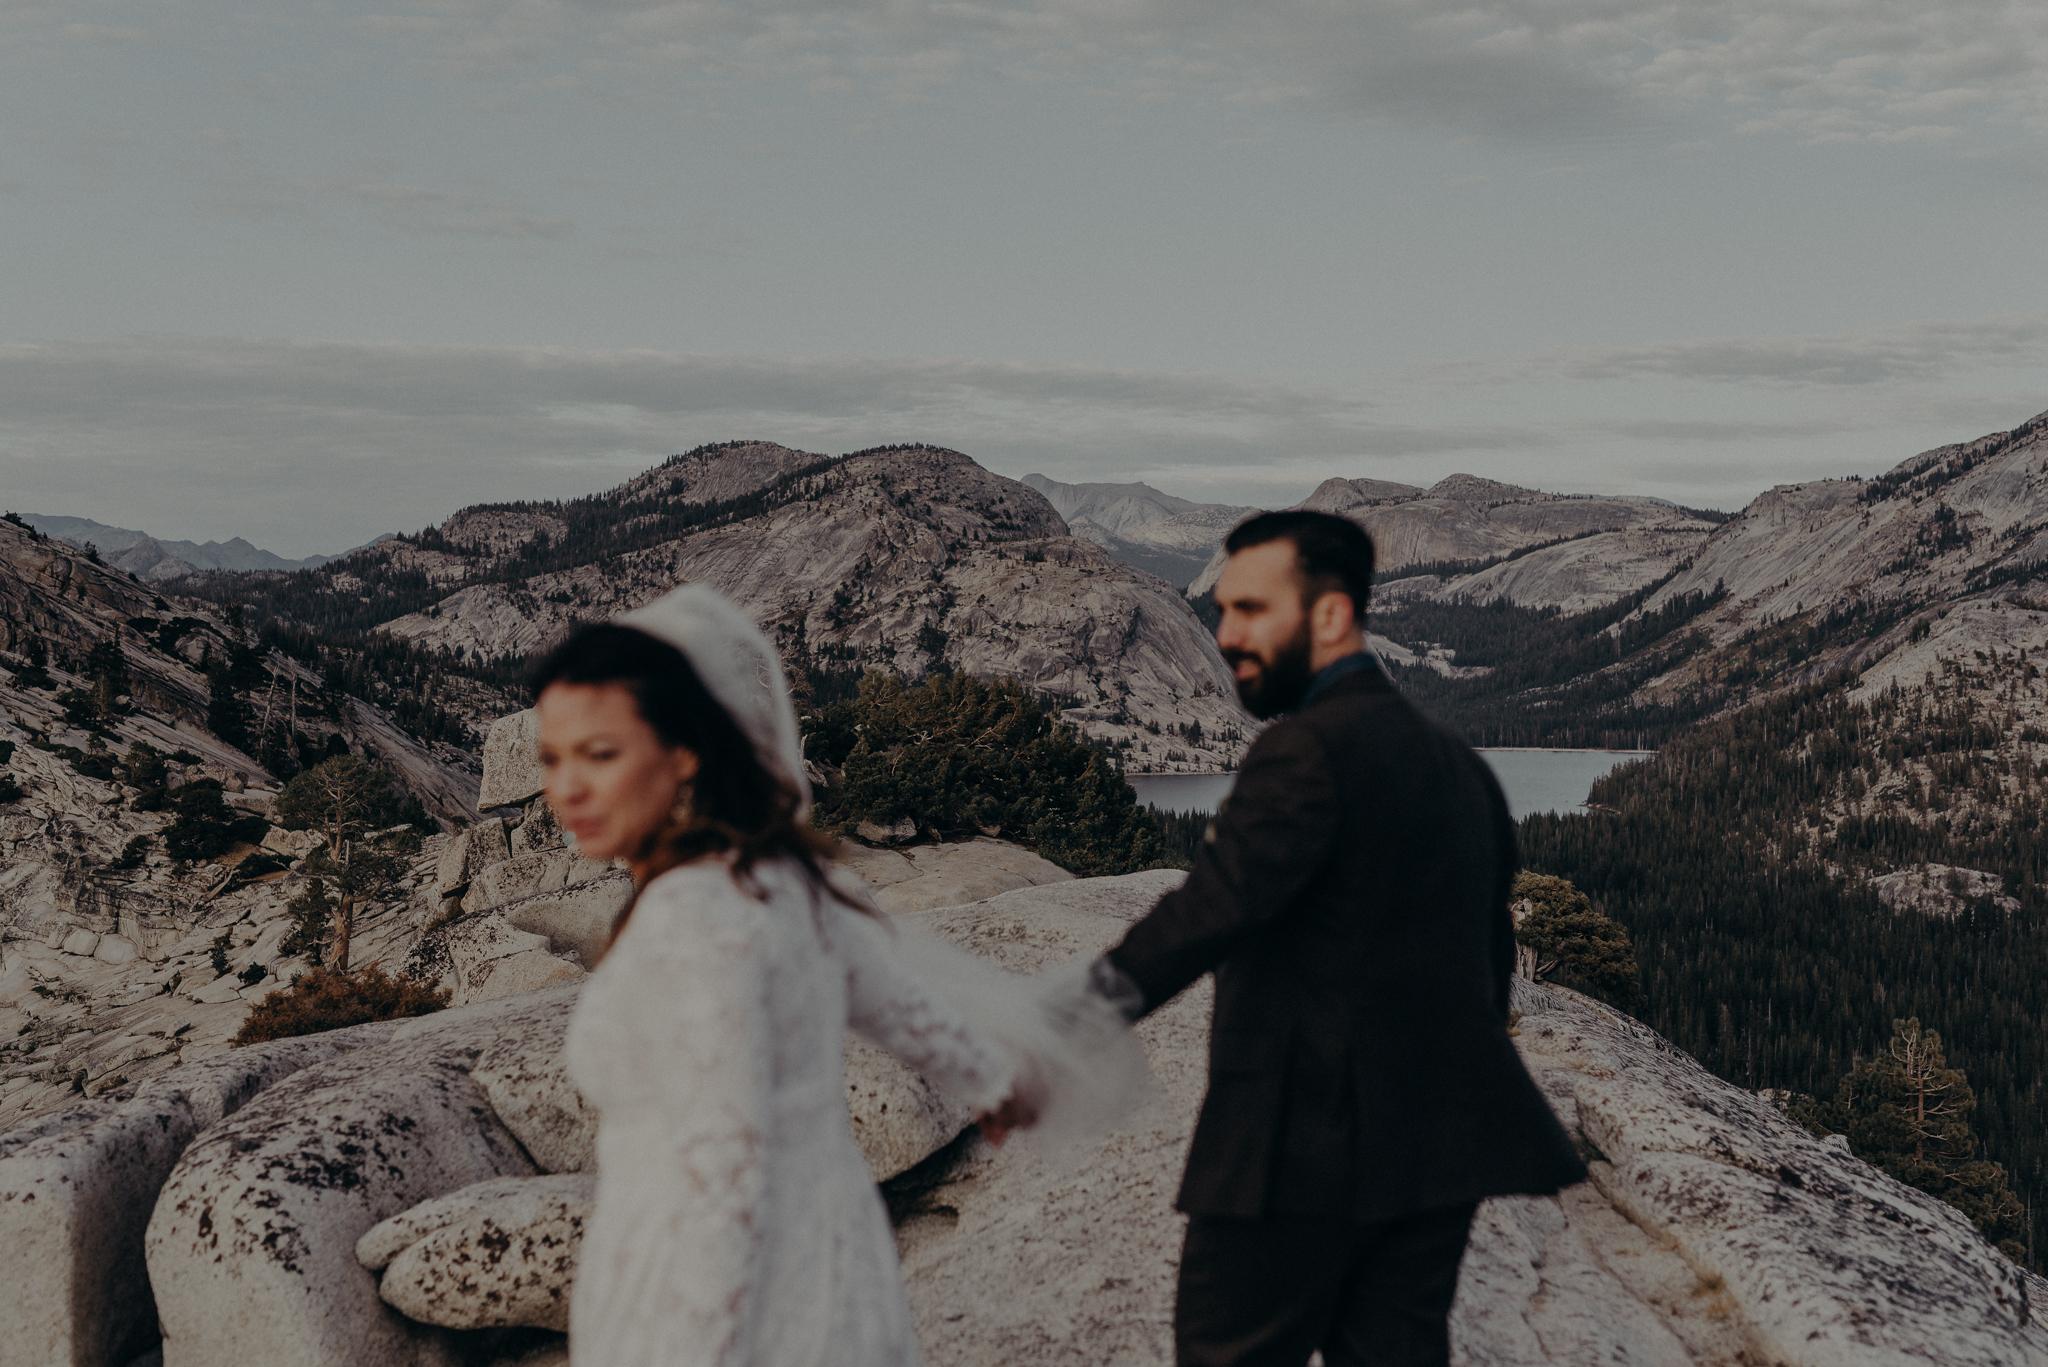 Yosemite Elopement Photographer - Evergreen Lodge Wedding Photographer - IsaiahAndTaylor.com-013.jpg